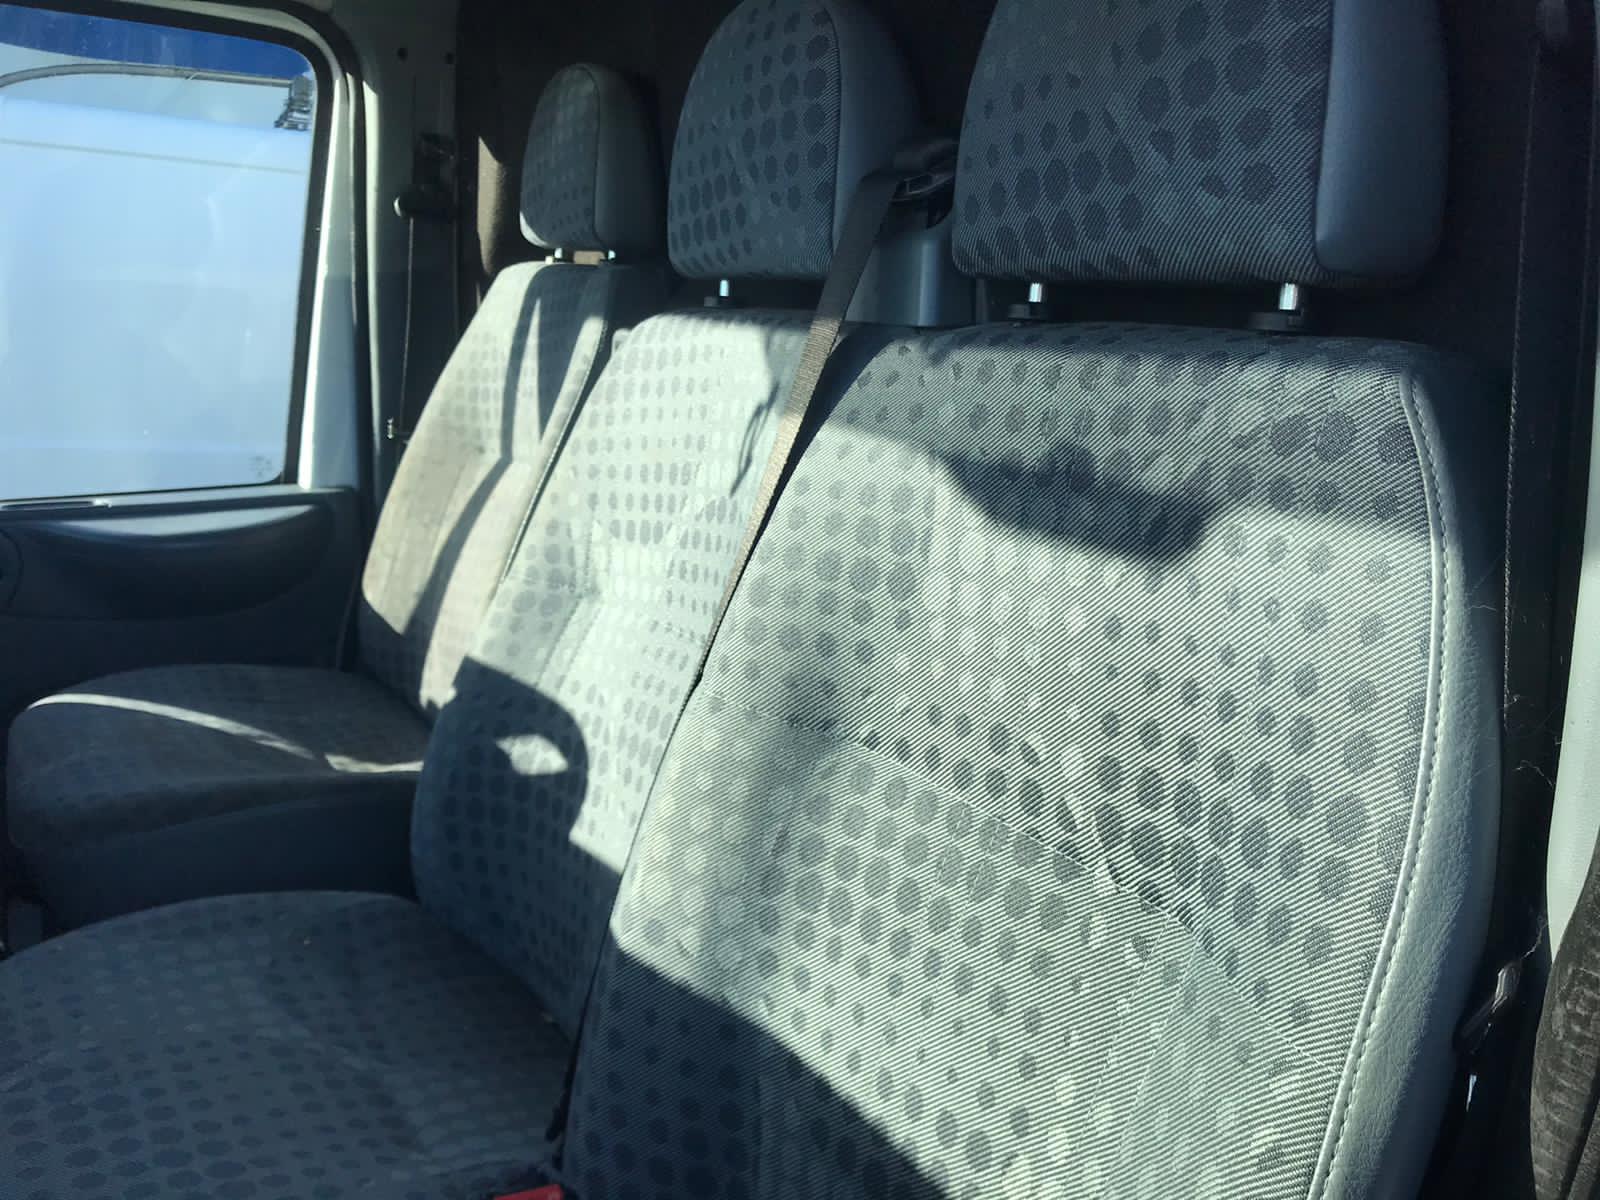 (RESERVE MET) Ford Transit 2.2 TDCI 100 T260 2014 Model - SWB - Low Roof -NO VAT SAVE 20% - Image 20 of 22